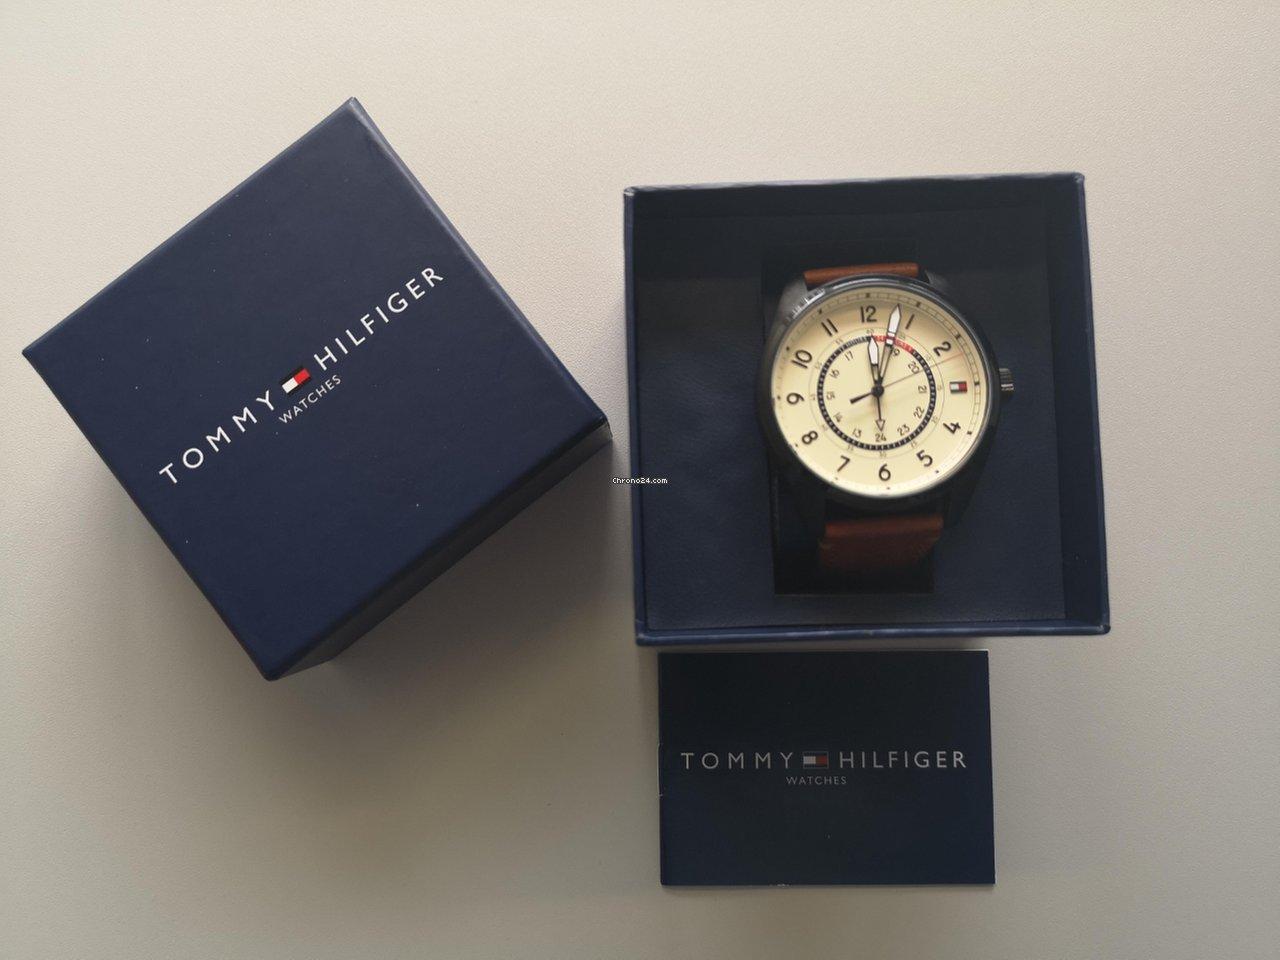 d719f869e10 Comprar relógios Tommy Hilfiger